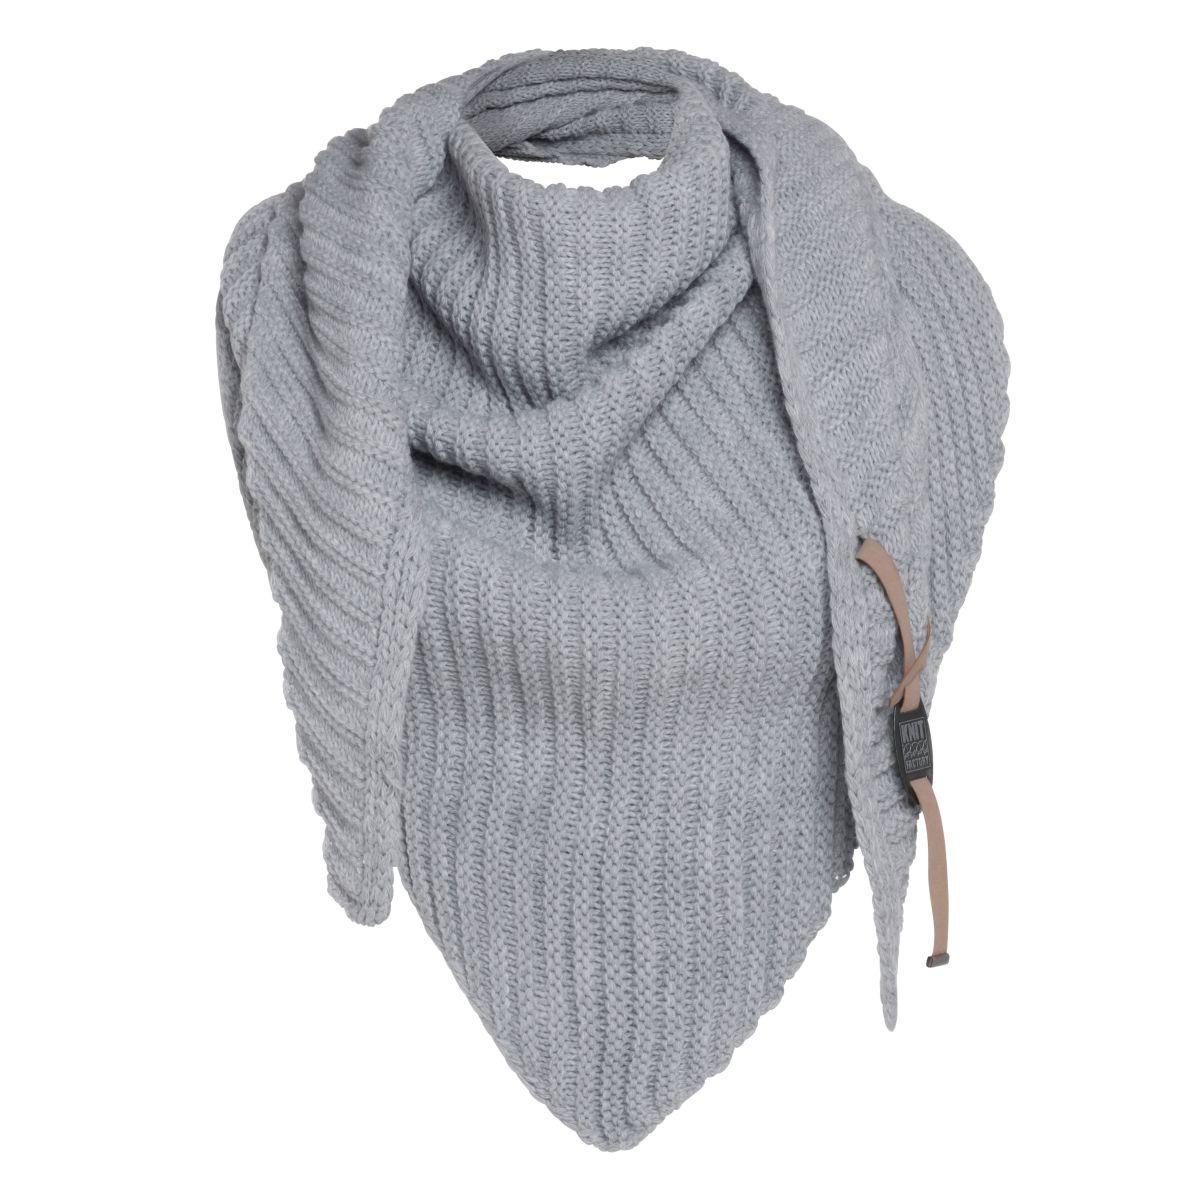 knit factory kf14706001150 demy omslagdoek licht grijs 3